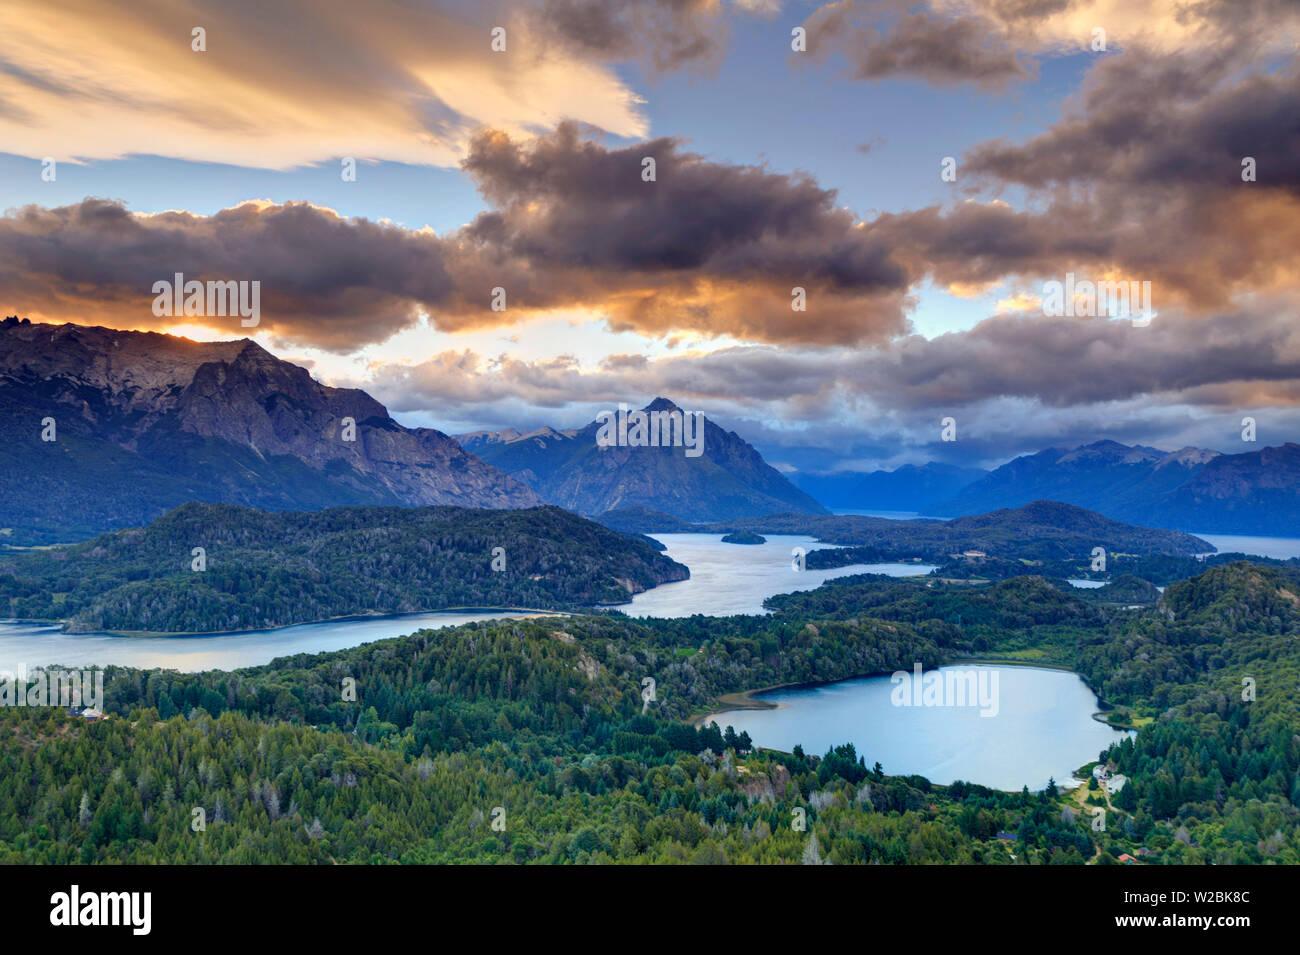 Argentina, Patagonia, Bariloche, Nahuel Huapi National Park, view from Cerro Campanario Peak - Stock Image